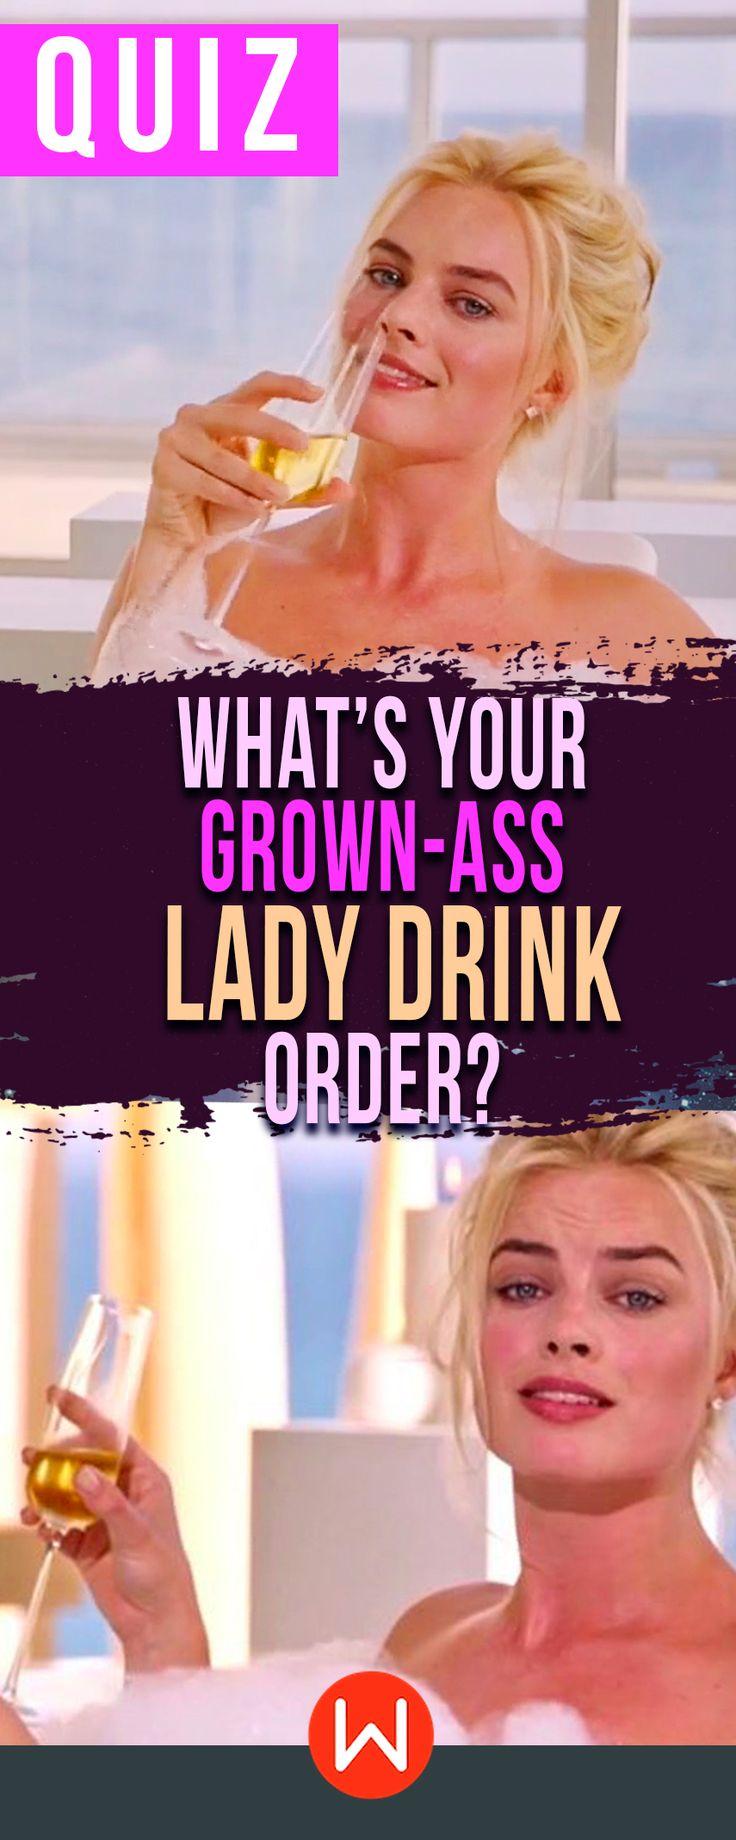 Quiz: What's your grown-ass Lady drink? Personality quiz, fun test, booze quiz, Personality test, buzzfeed quizzes, playbuzz quiz.